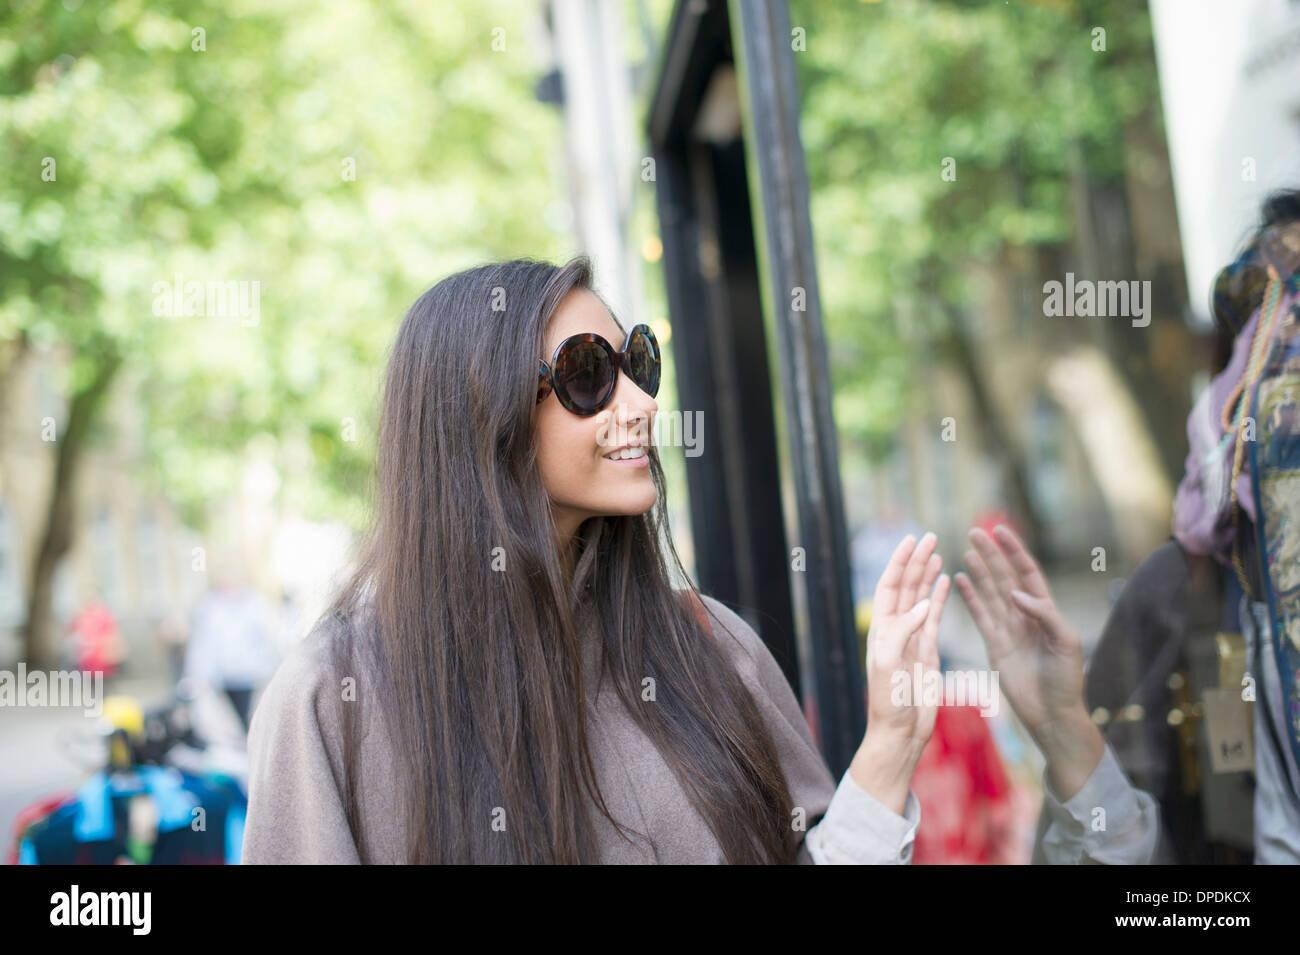 Young woman window shopping - Stock Image